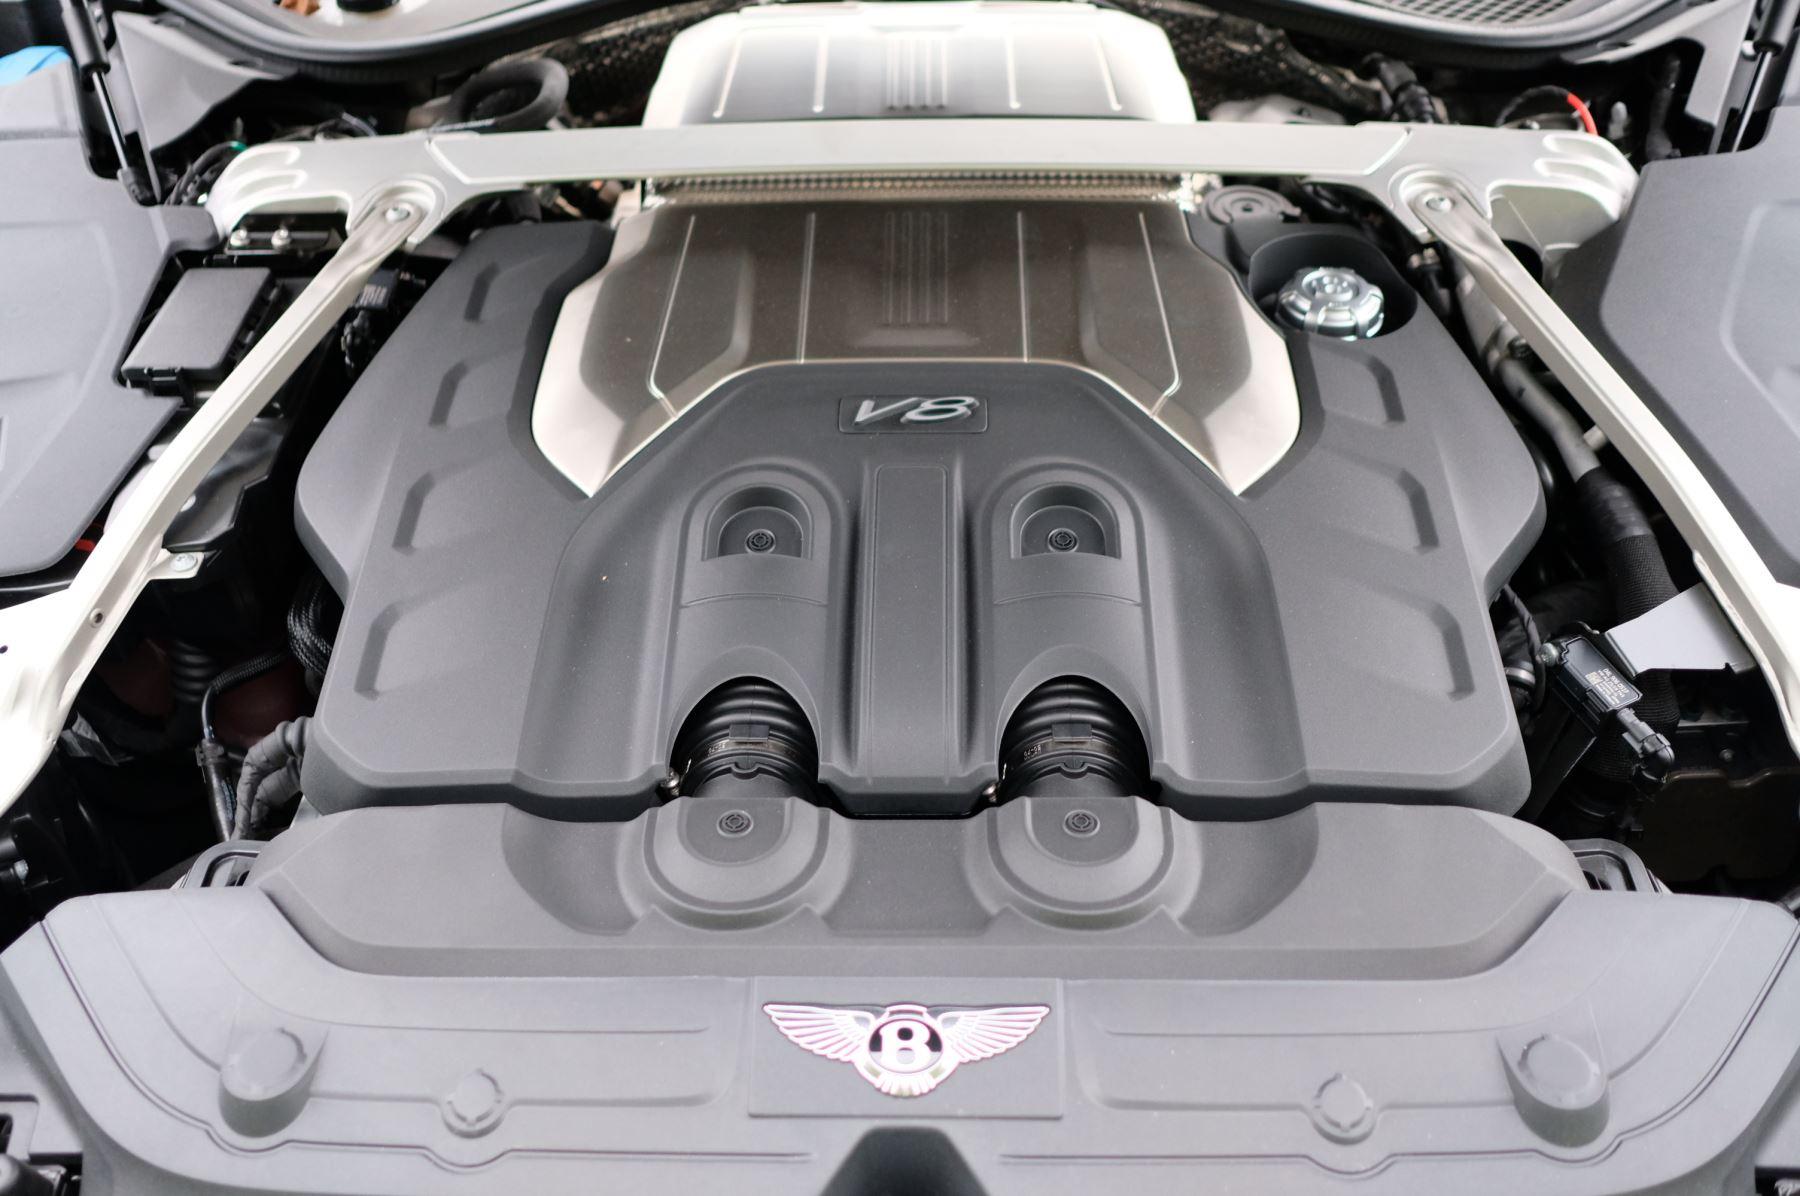 Bentley Continental GTC 4.0 V8 Mulliner Driving Spec 2dr Auto [Tour Spec] image 13